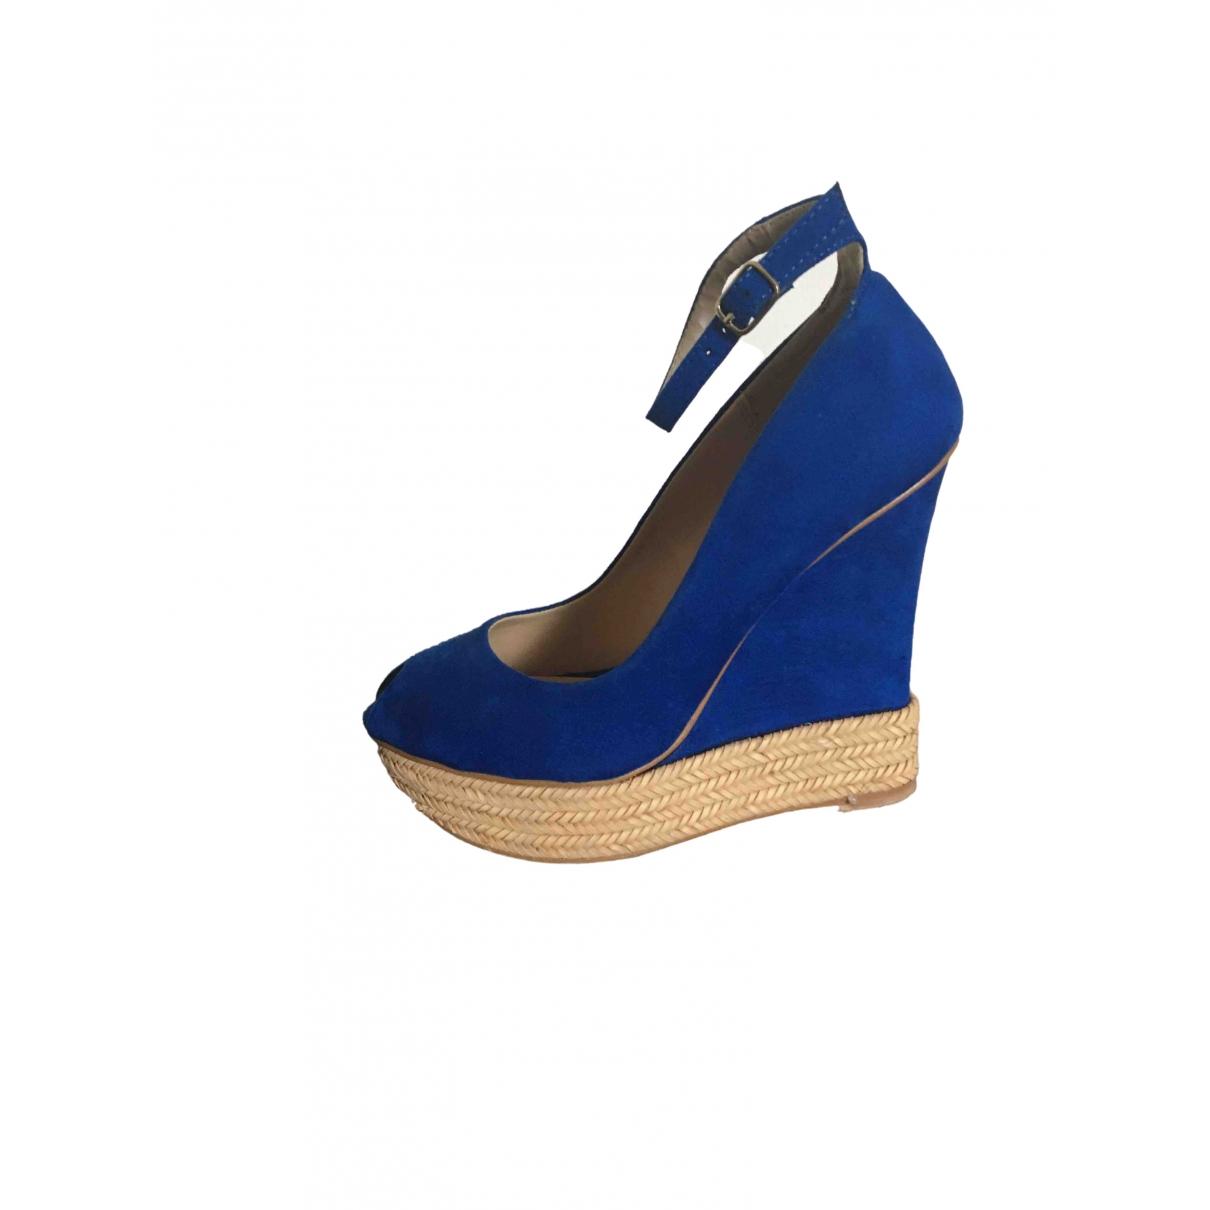 Zara \N Espadrilles in  Blau Veloursleder